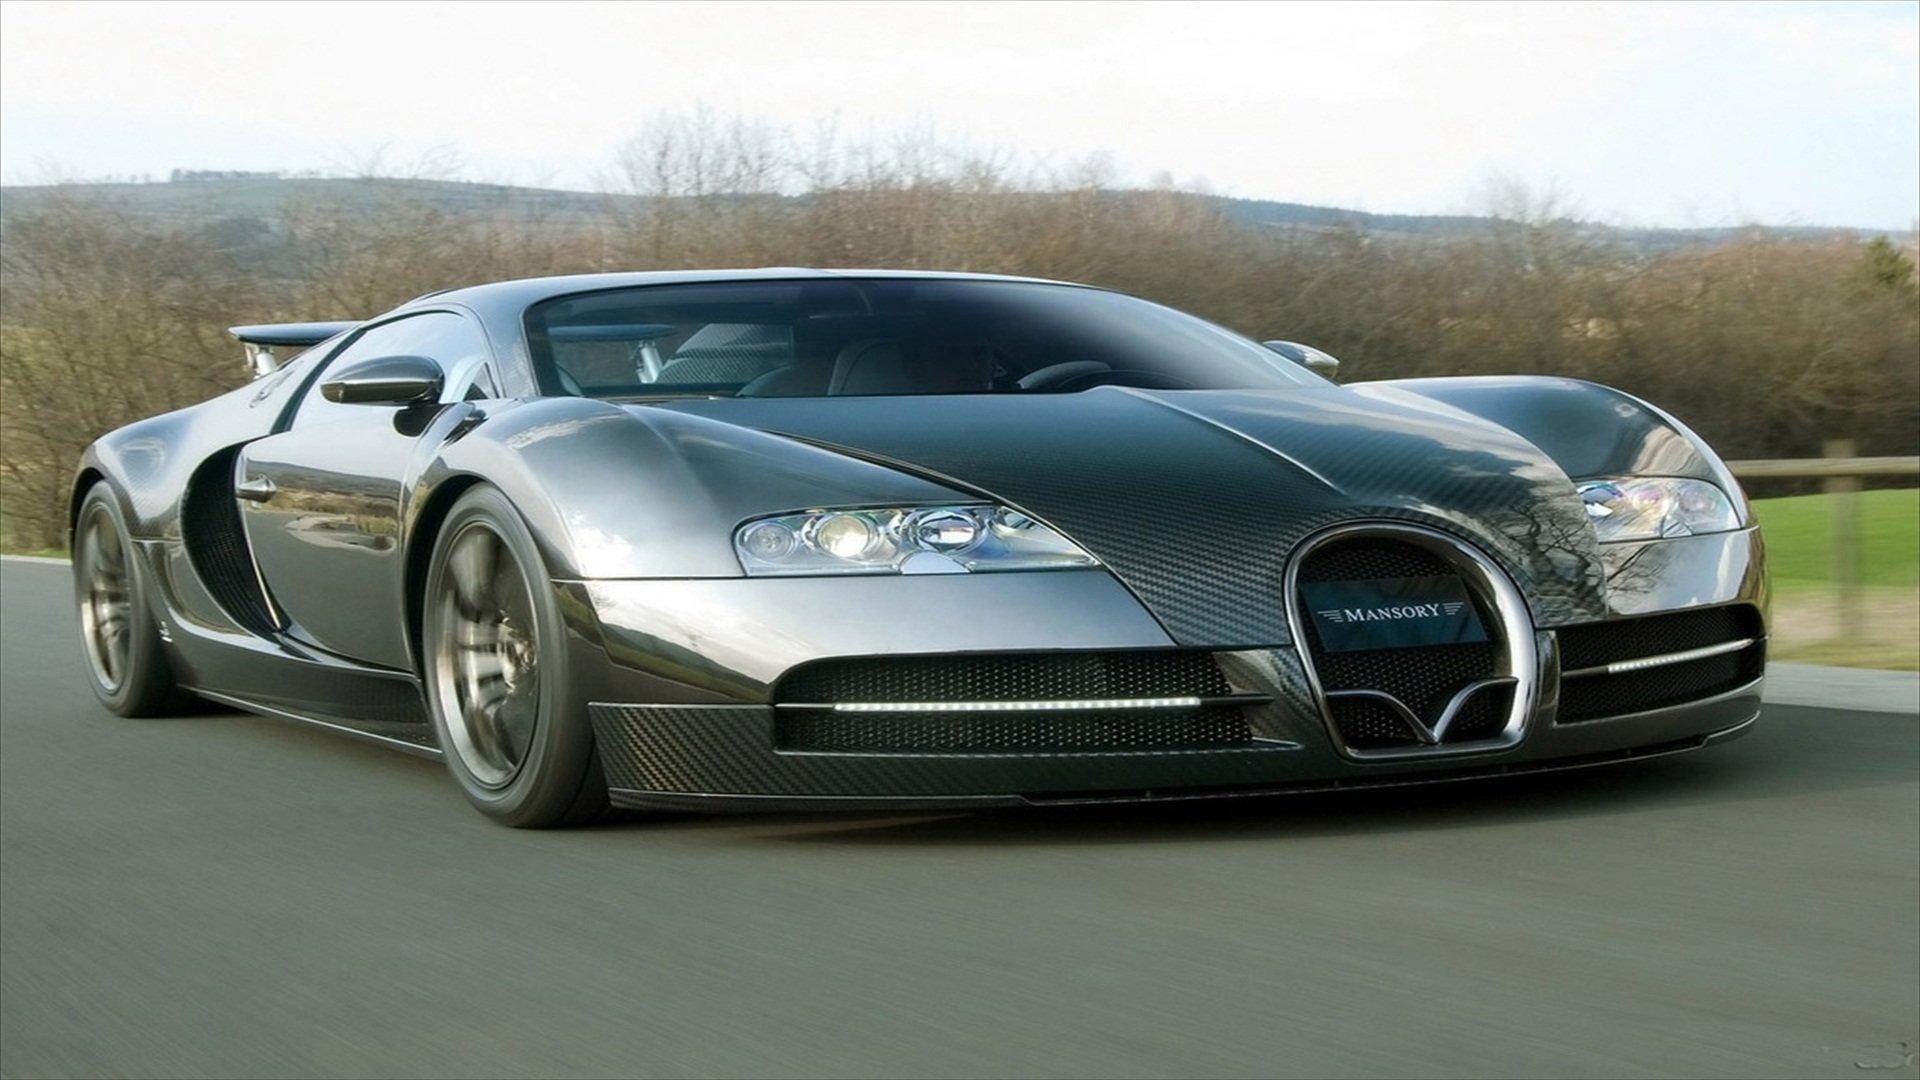 Bugatti Veyron Wallpapers 1920x1080 Full Hd 1080p Desktop